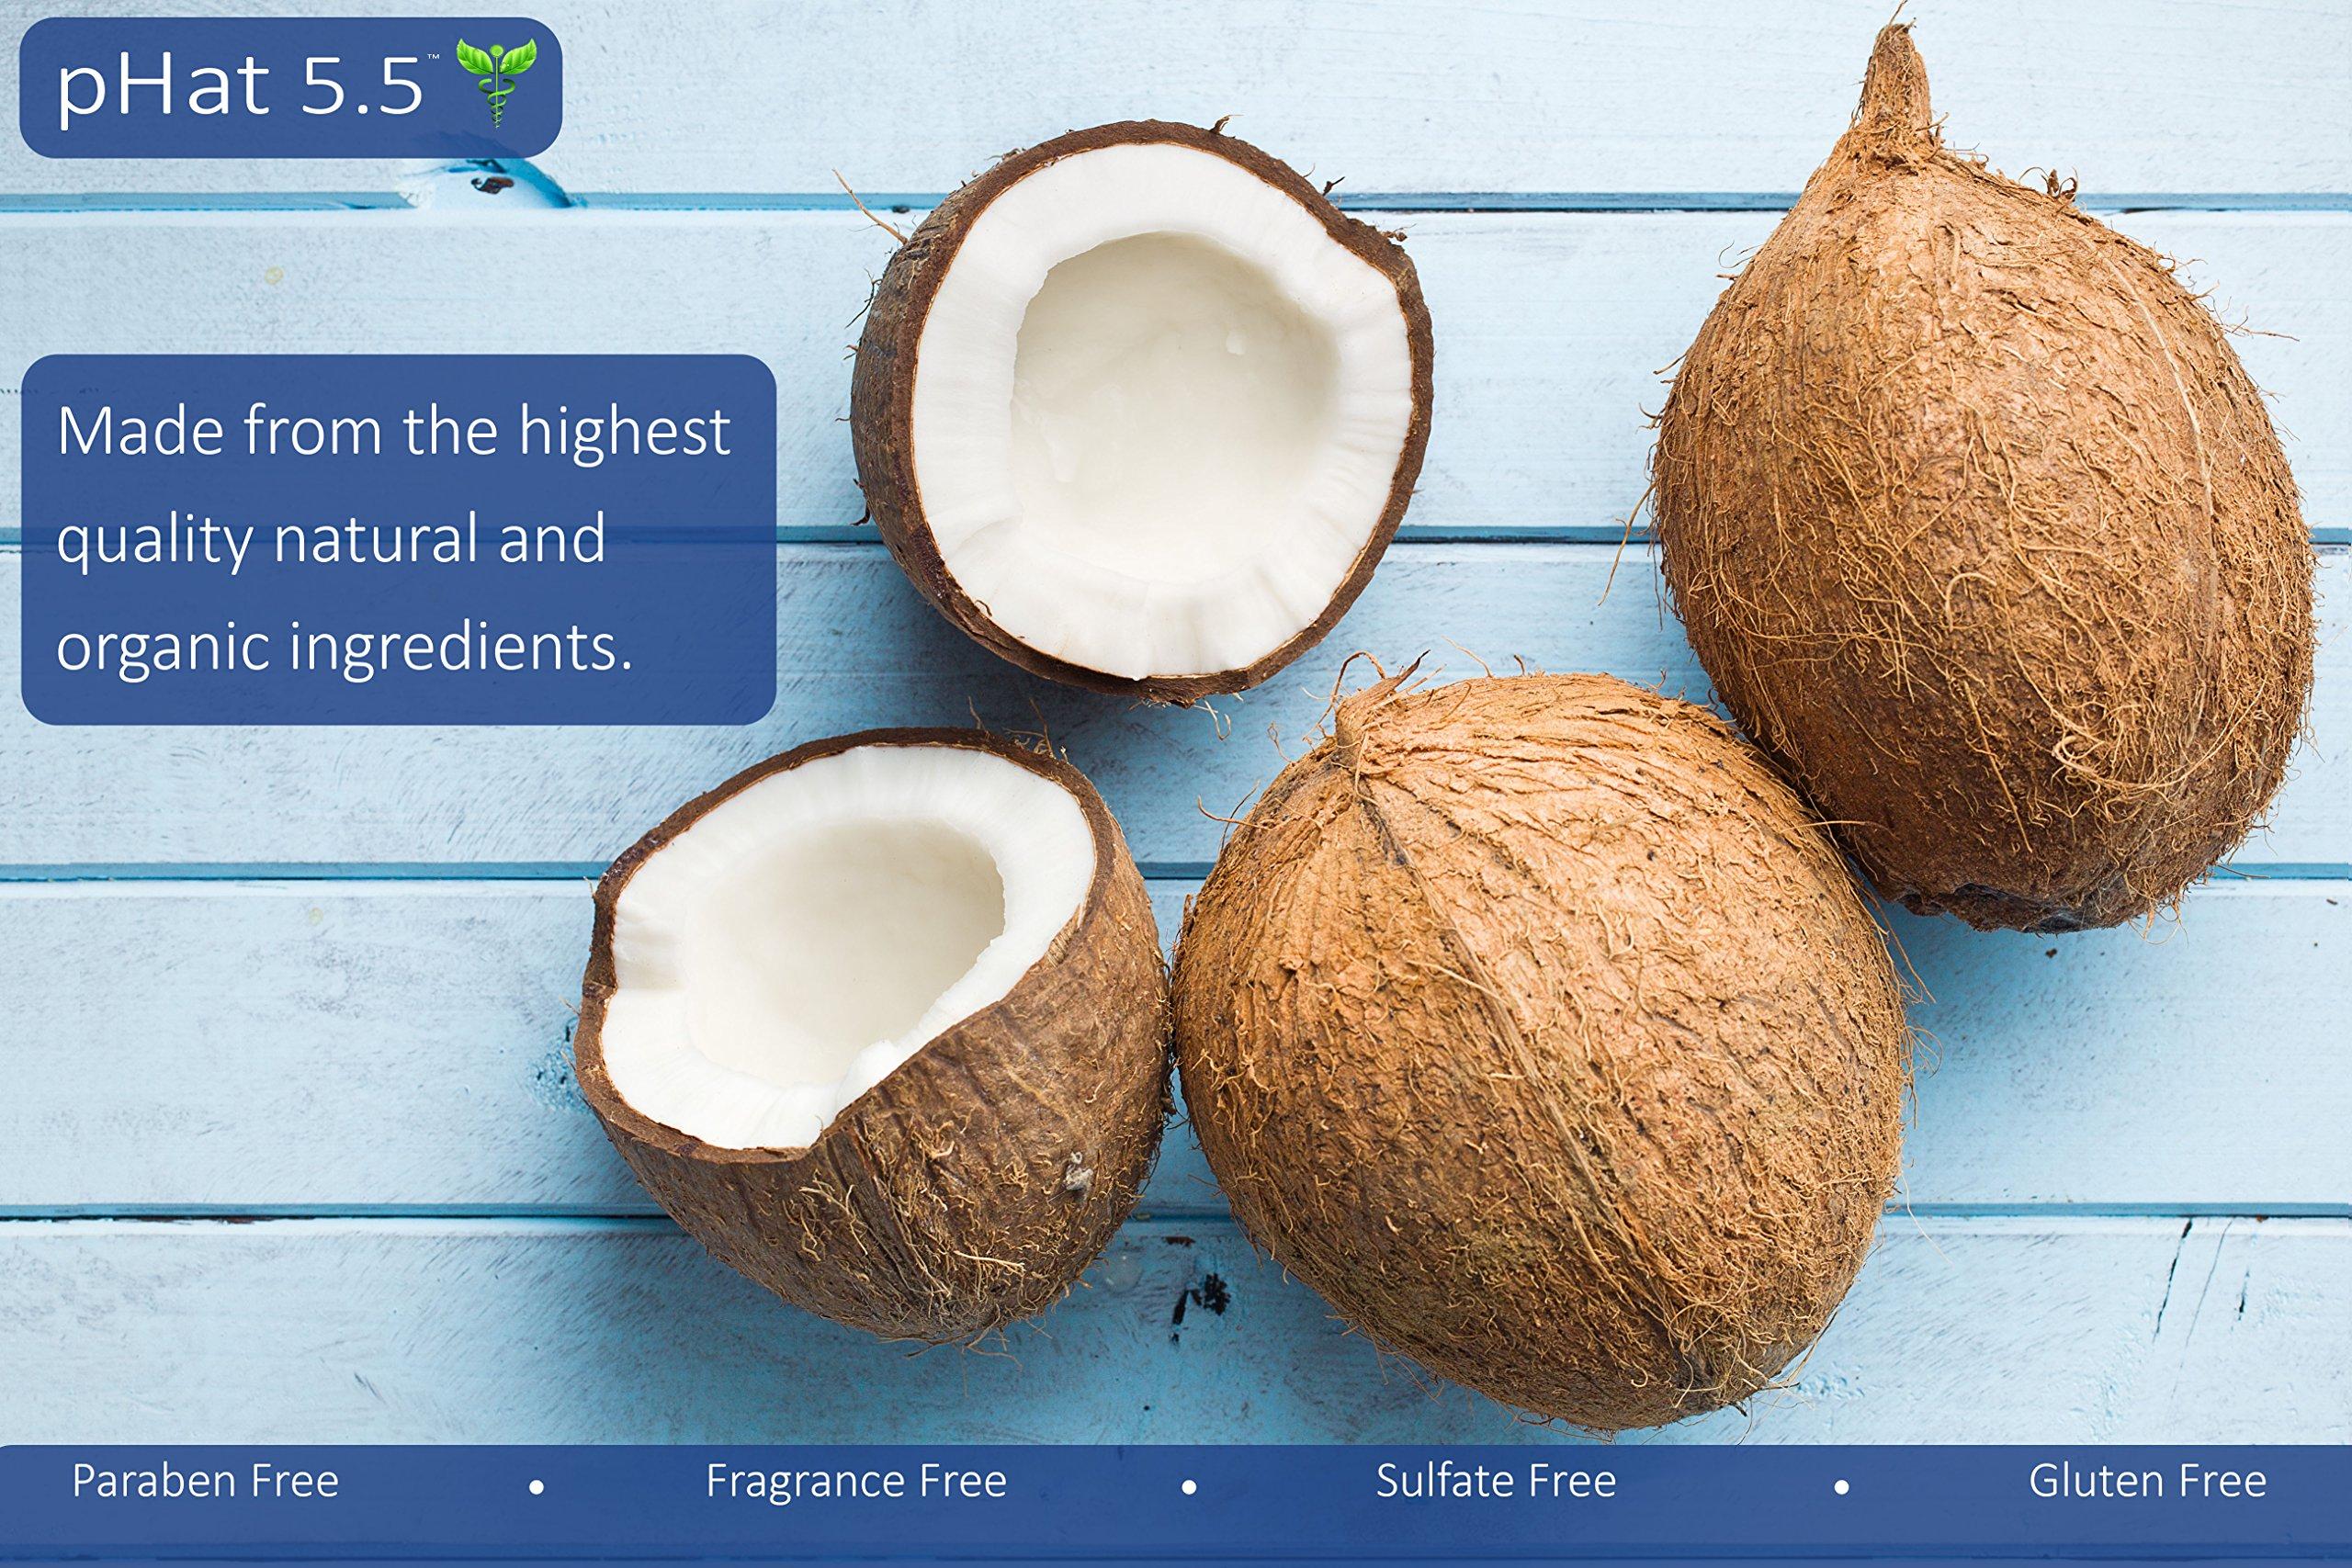 Sulfate Free Shampoo for Seborrheic Dermatitis with Manuka Honey, Coconut Oil and Aloe Vera - Dandruff and Itchy Scalp Treatment - Antifungal Moisturizing Shampoo for Dry Scalp Treatment (16 oz) by pHat 5.5 (Image #8)